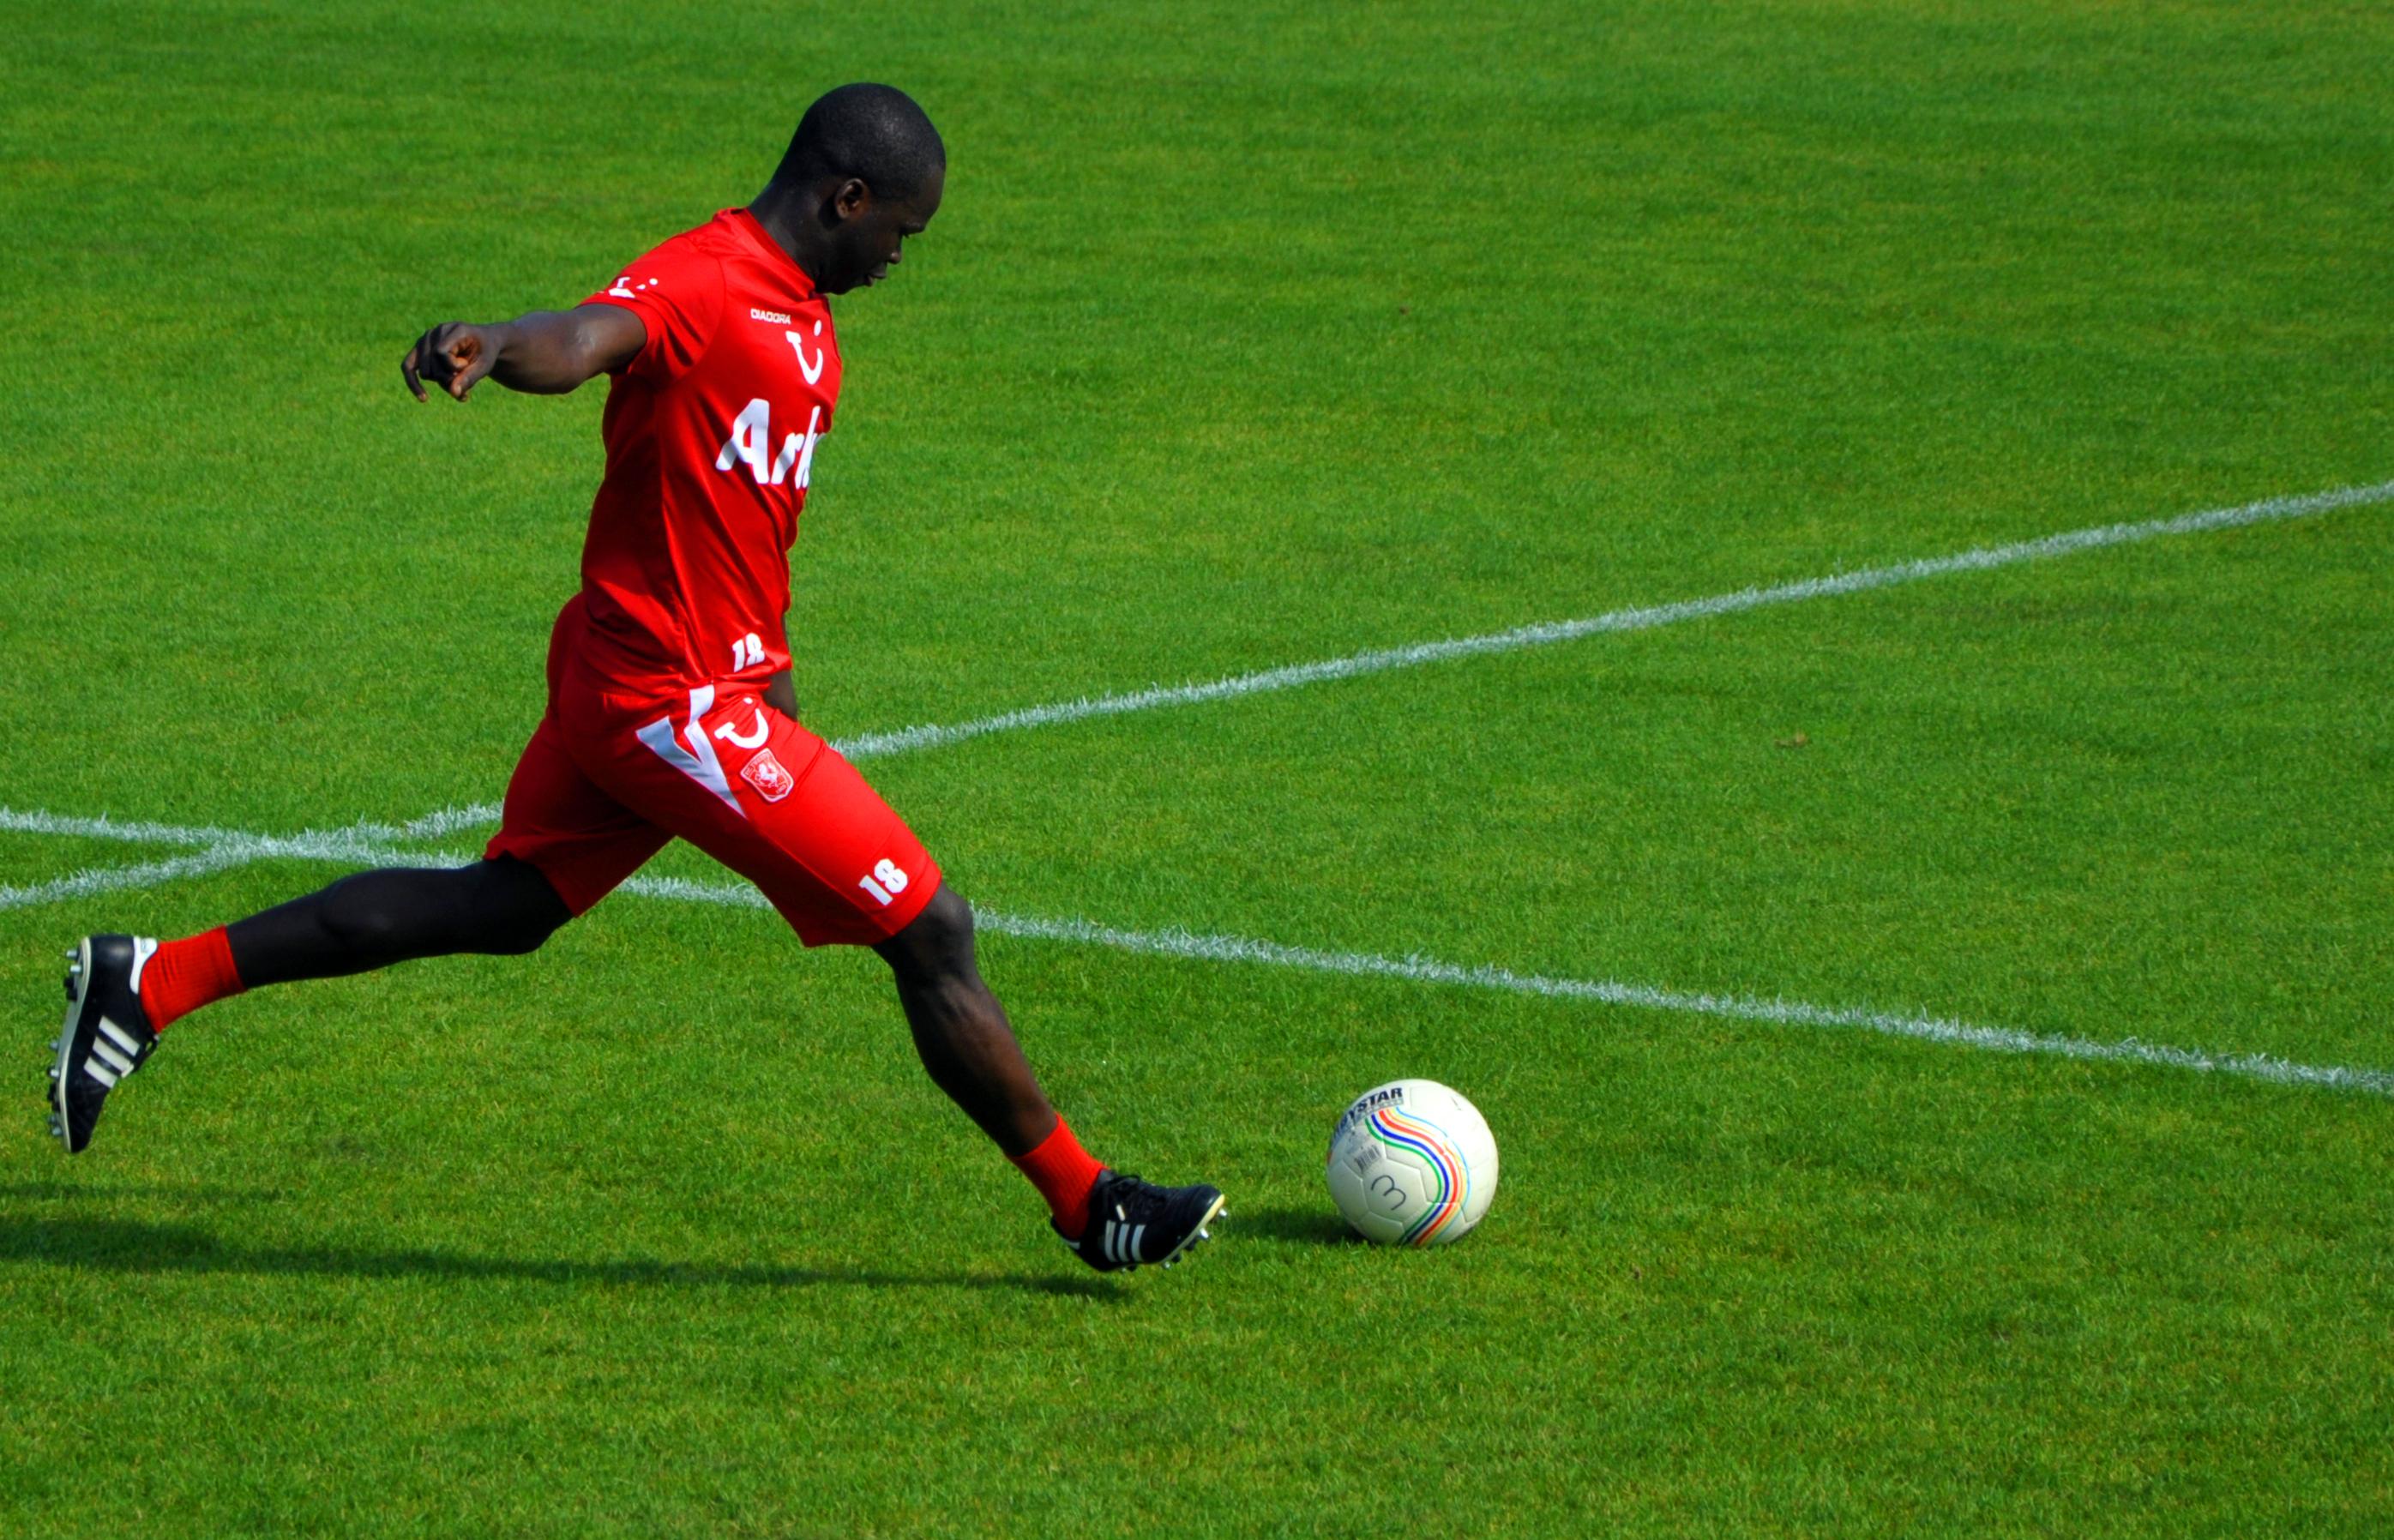 Cheik_Ismael_Tiote_Fc_Twente.jpg